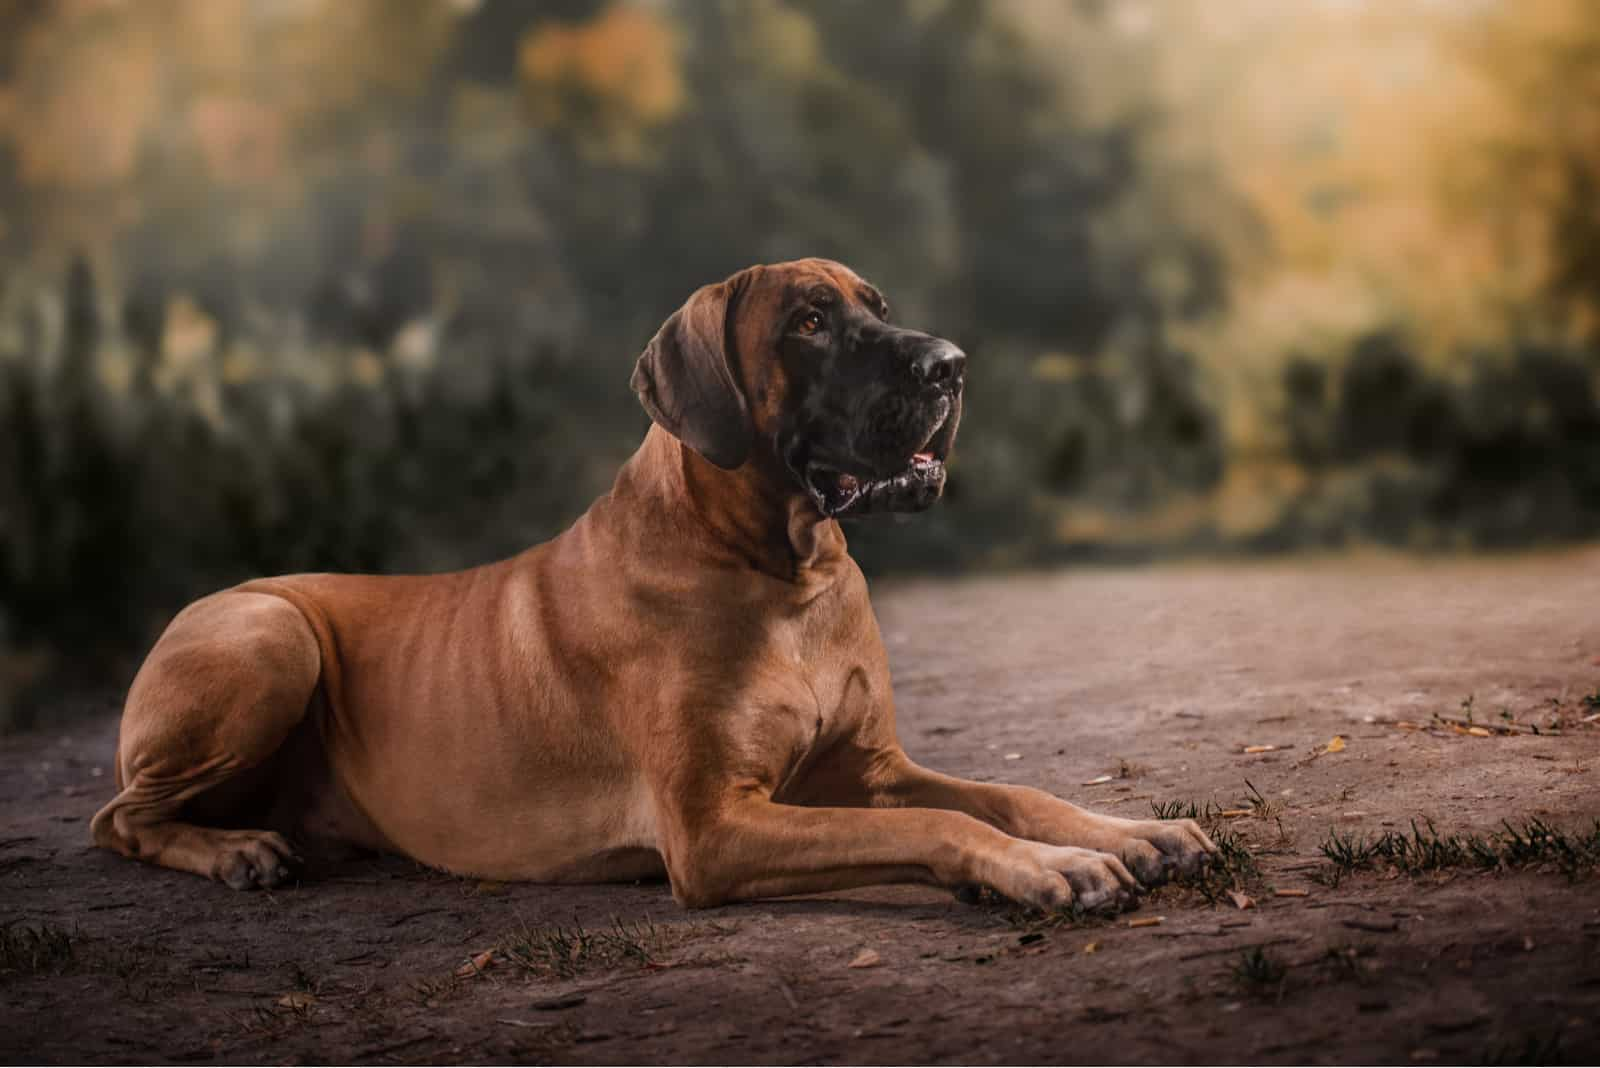 Great dane Dog lying on the ground